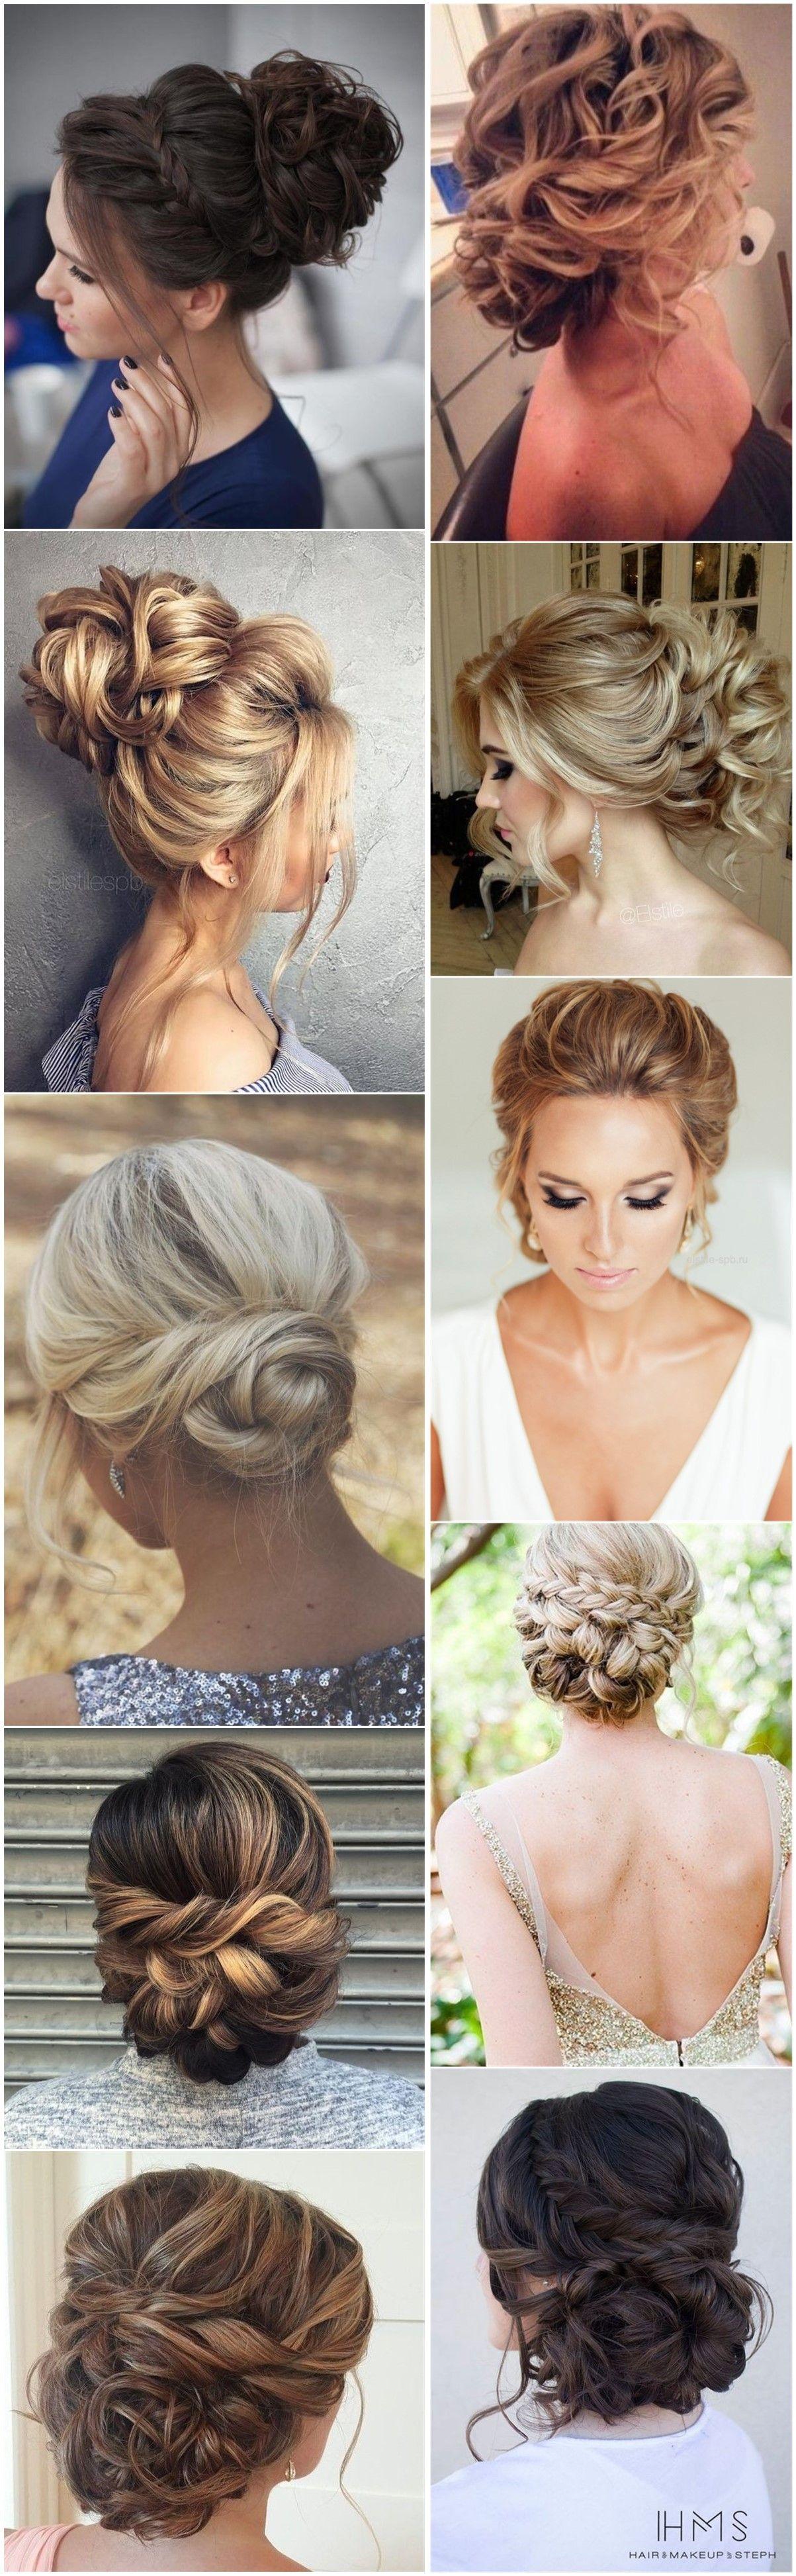 Quick Wedding Hairstyles